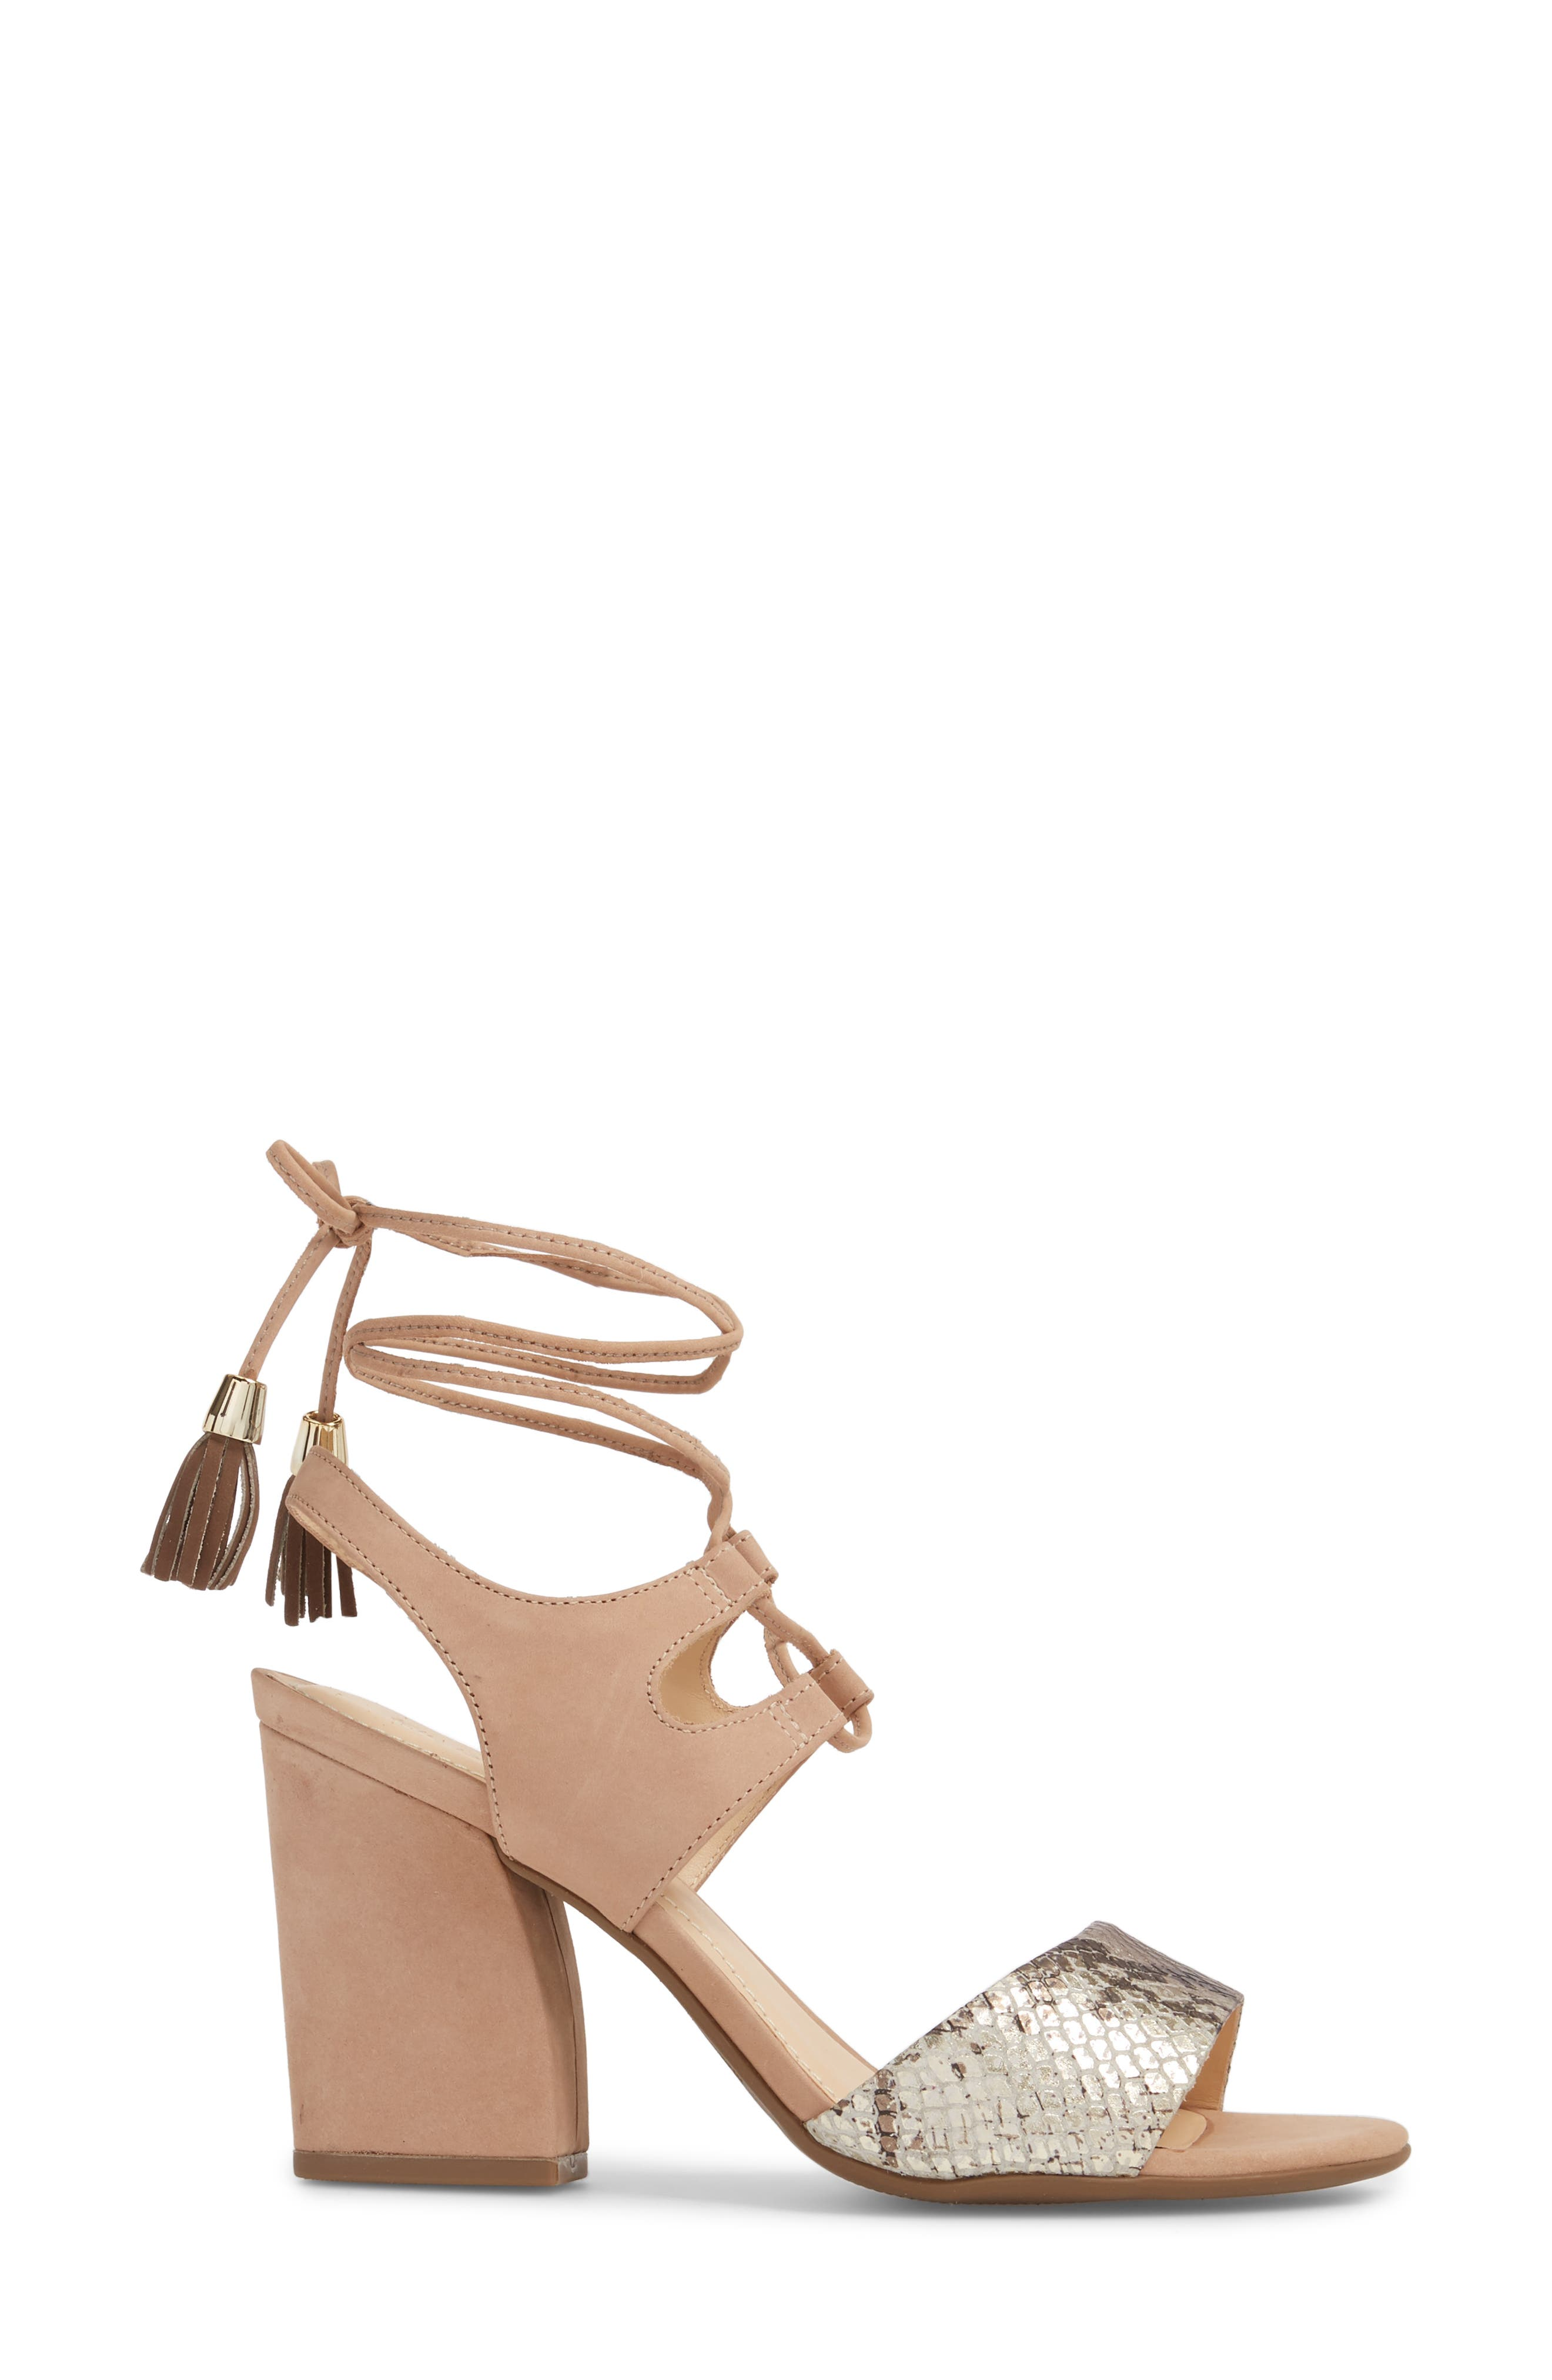 Kaira Ankle Wrap Sandal,                             Alternate thumbnail 3, color,                             SNAKE PRINT LEATHER